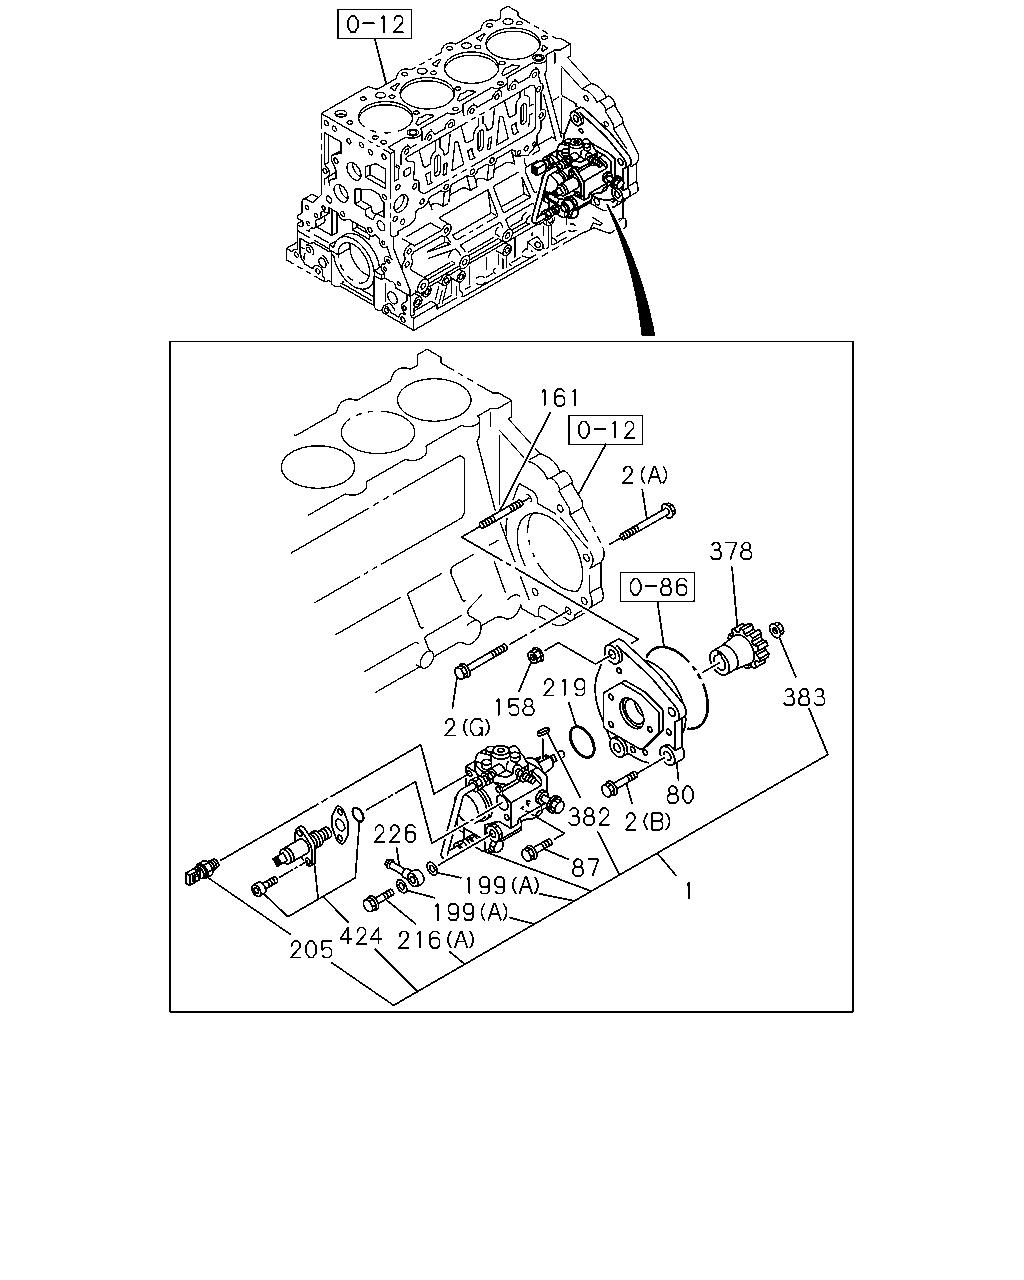 Isuzu 4hf1 Wiring Diagram - Function Wiring Diagram